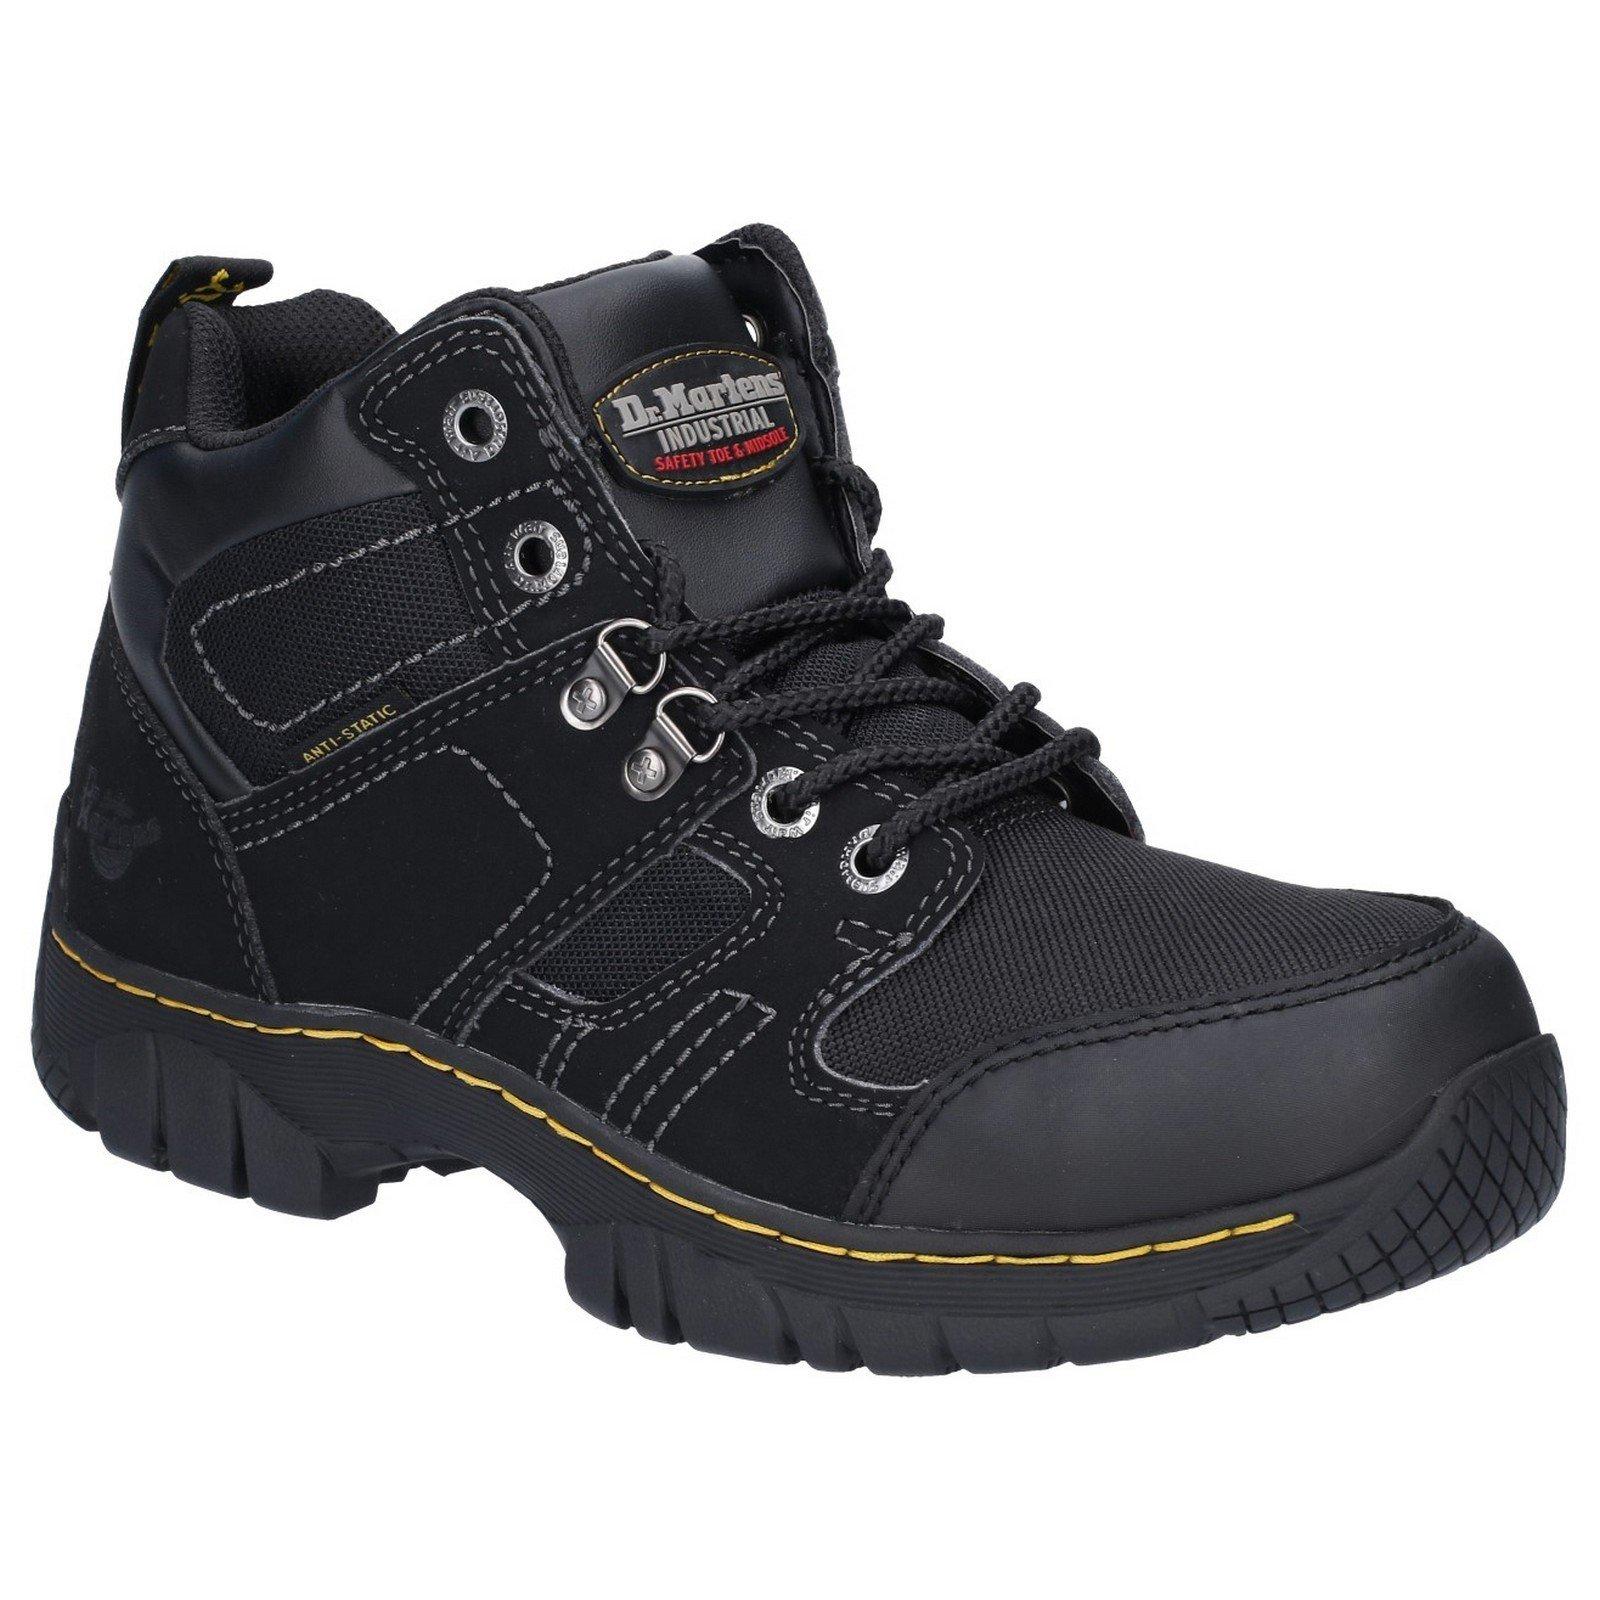 Dr Martens Unisex Benham Safety Boots Black 21647-34773 - Black 8